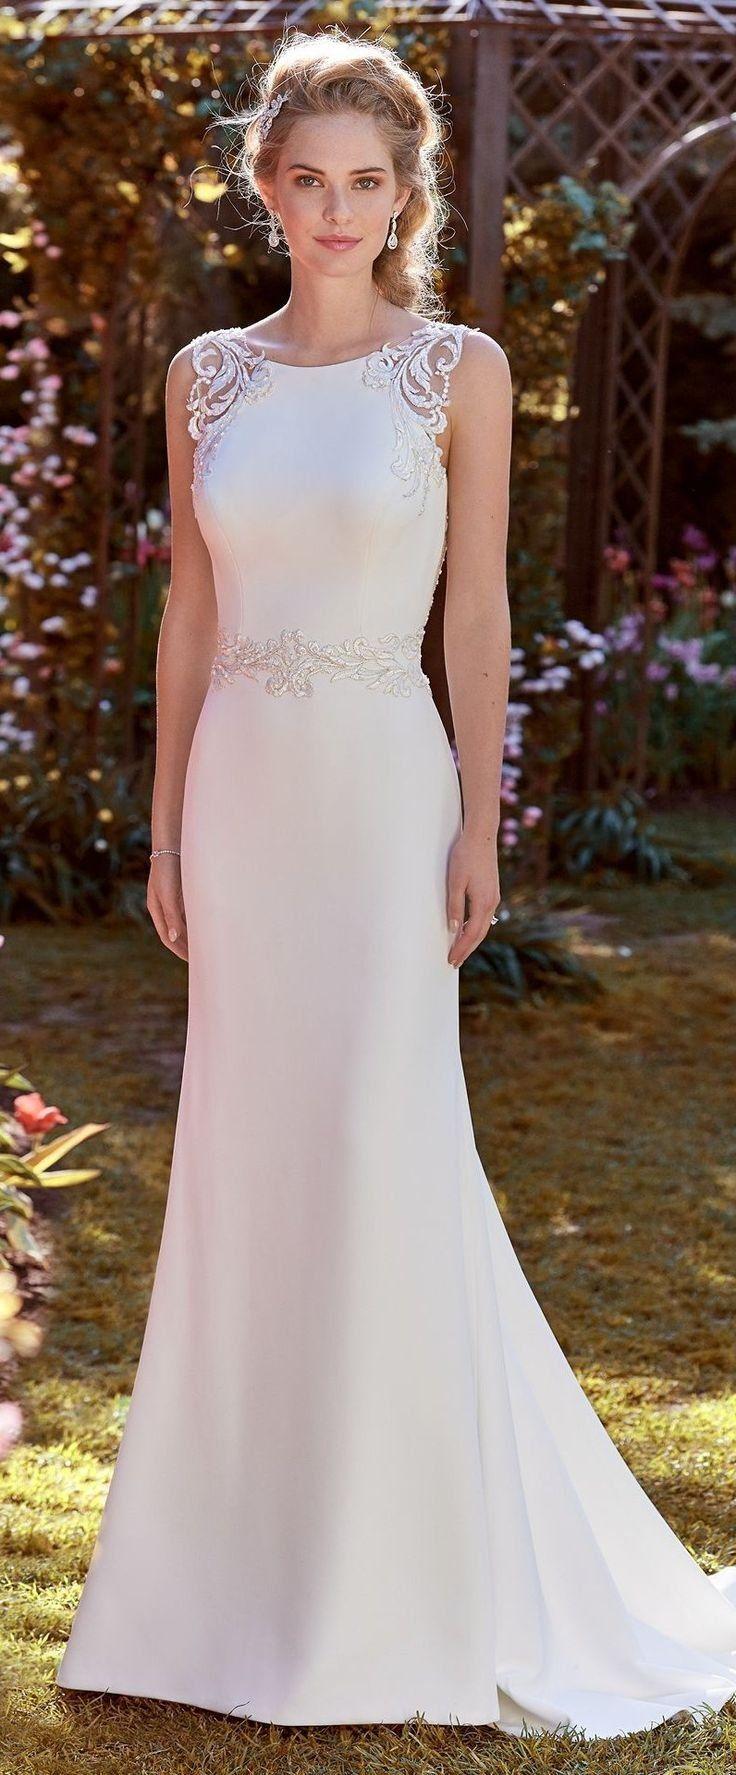 Beaded sheath wedding dress  Rebecca Ingram  ADA Beaded lace motifs adorn the illusion straps